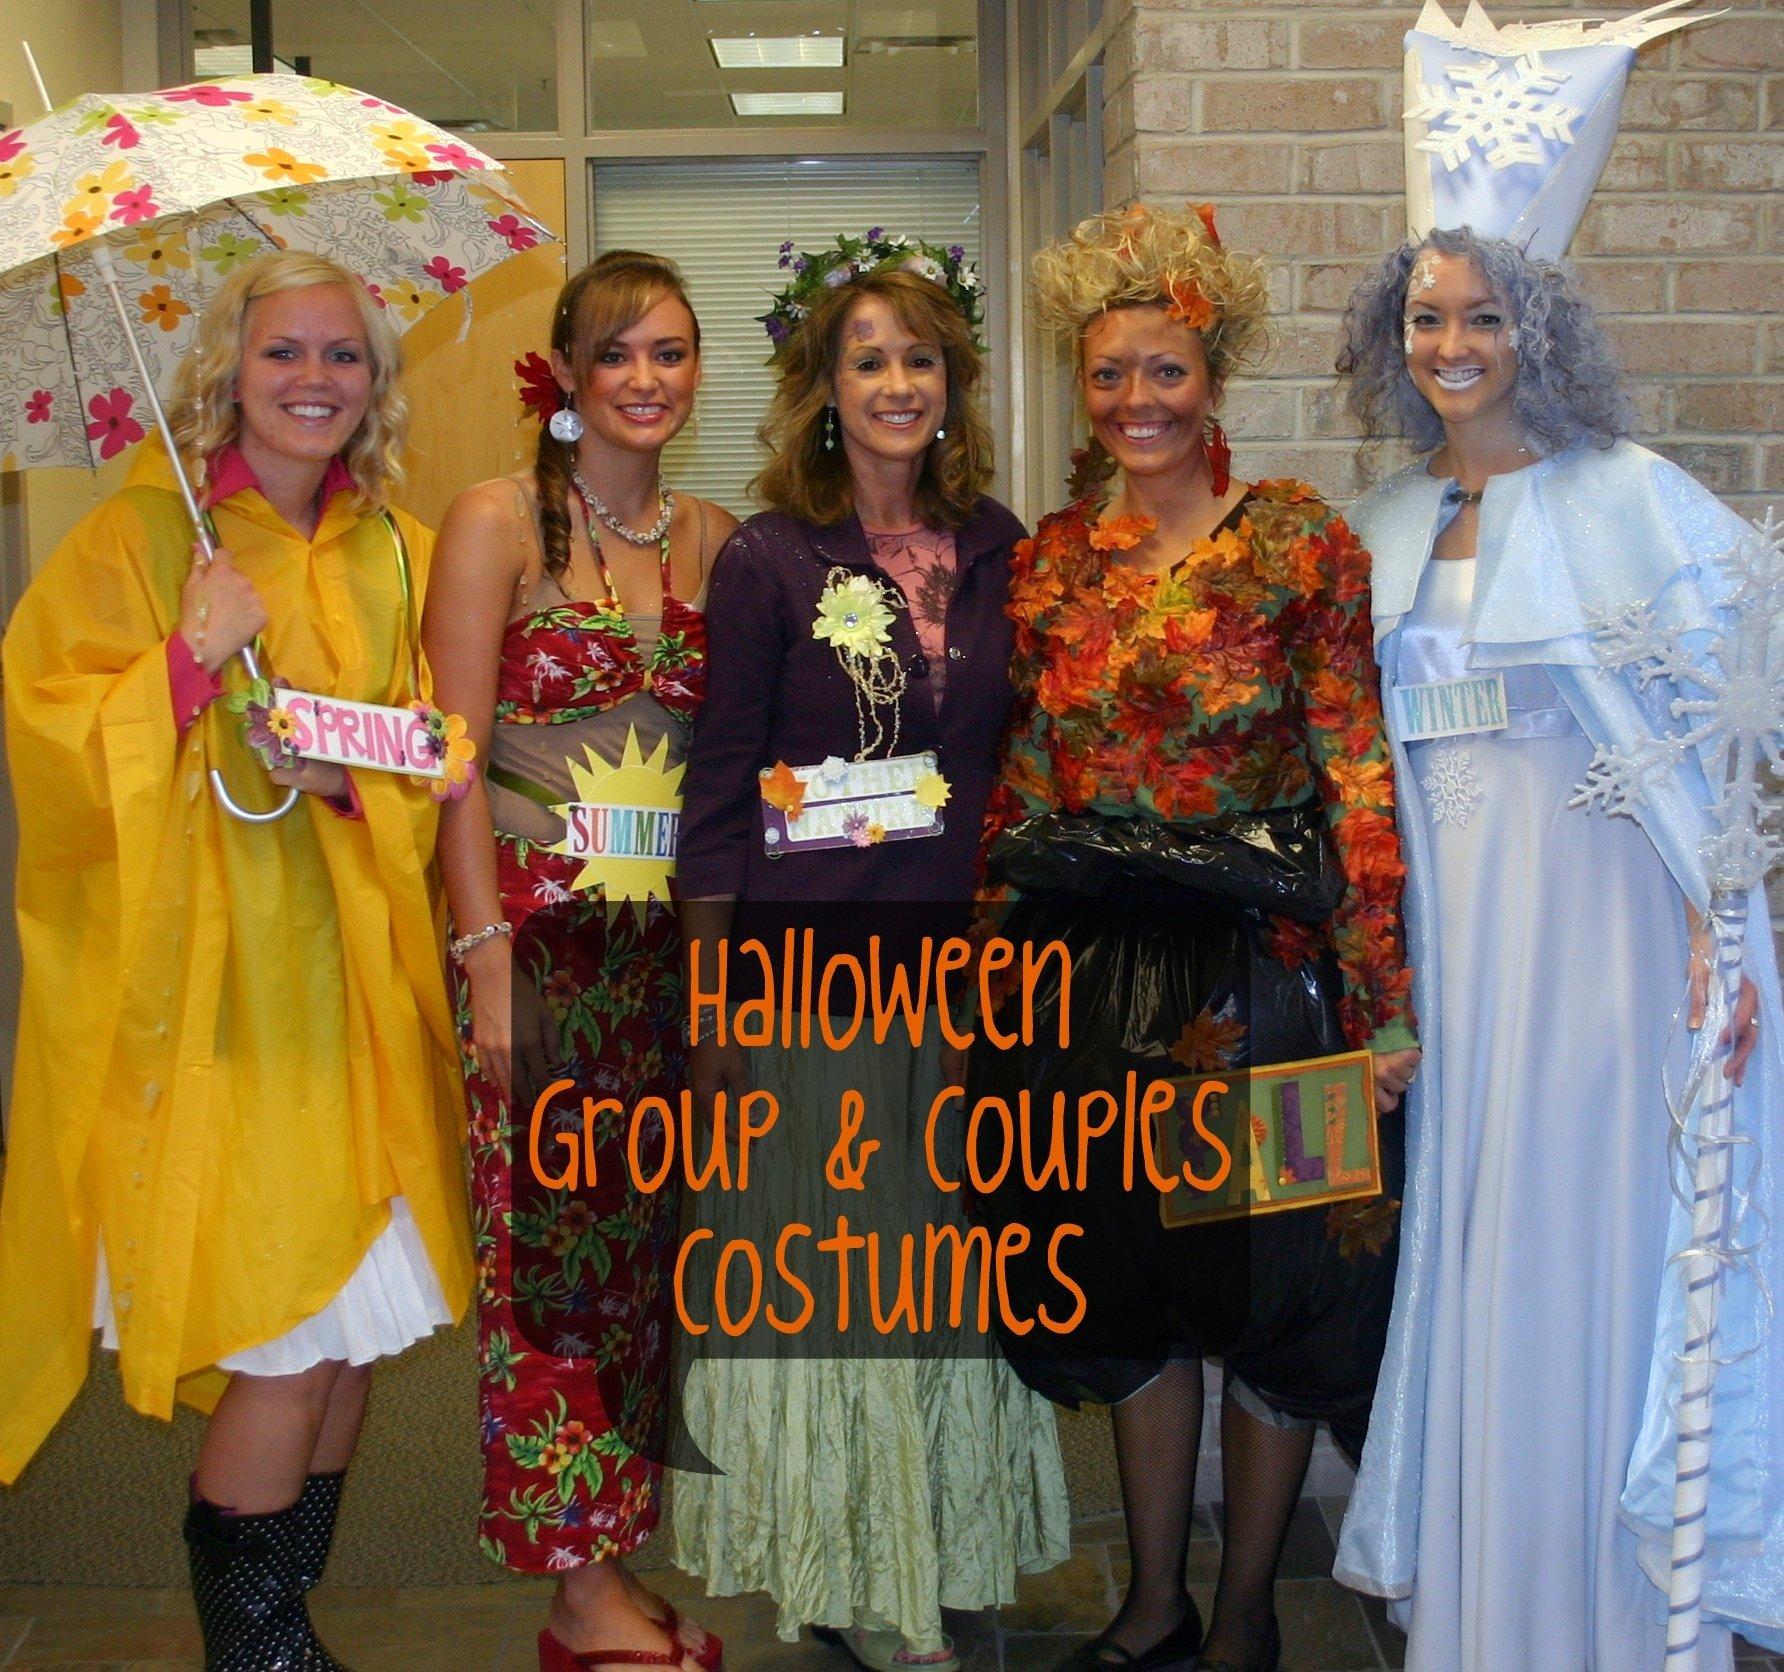 10 Trendy Group Of 4 Halloween Costume Ideas fun group and couples halloween costume ideas 30 days of halloween 2020